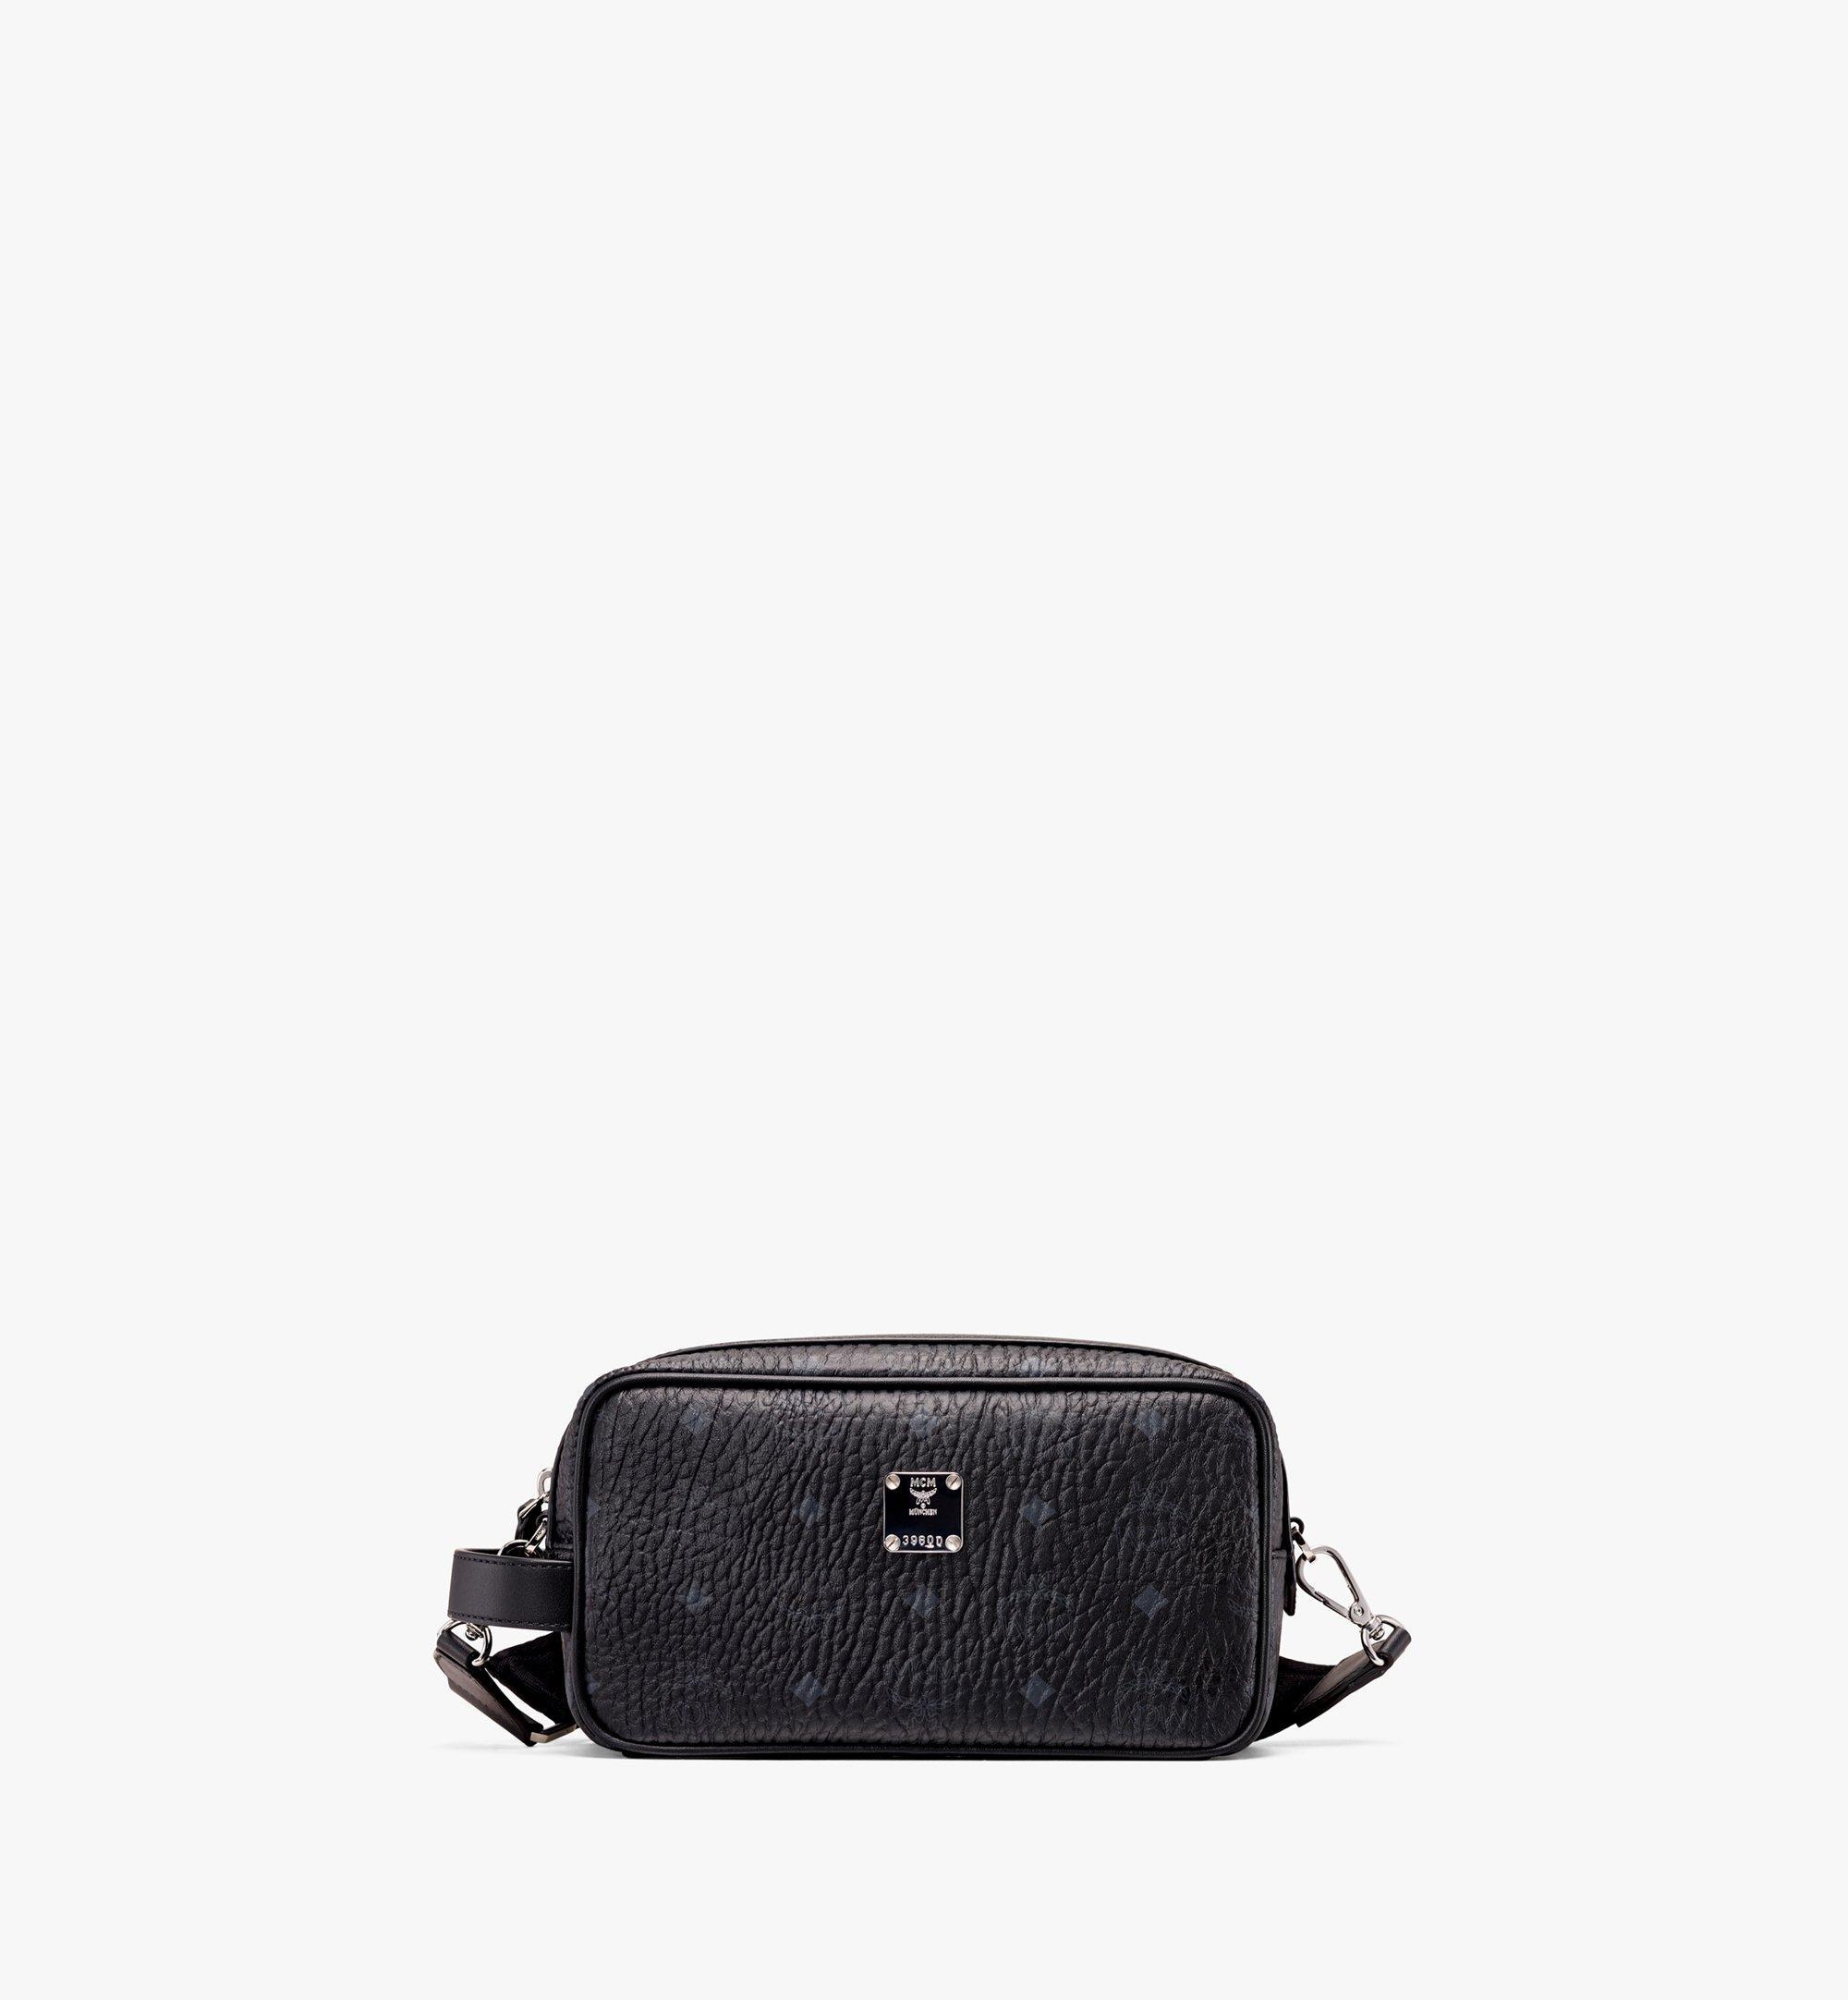 MCM Wash Bag in Visetos Black MXZ9AVI51BK001 Alternate View 1